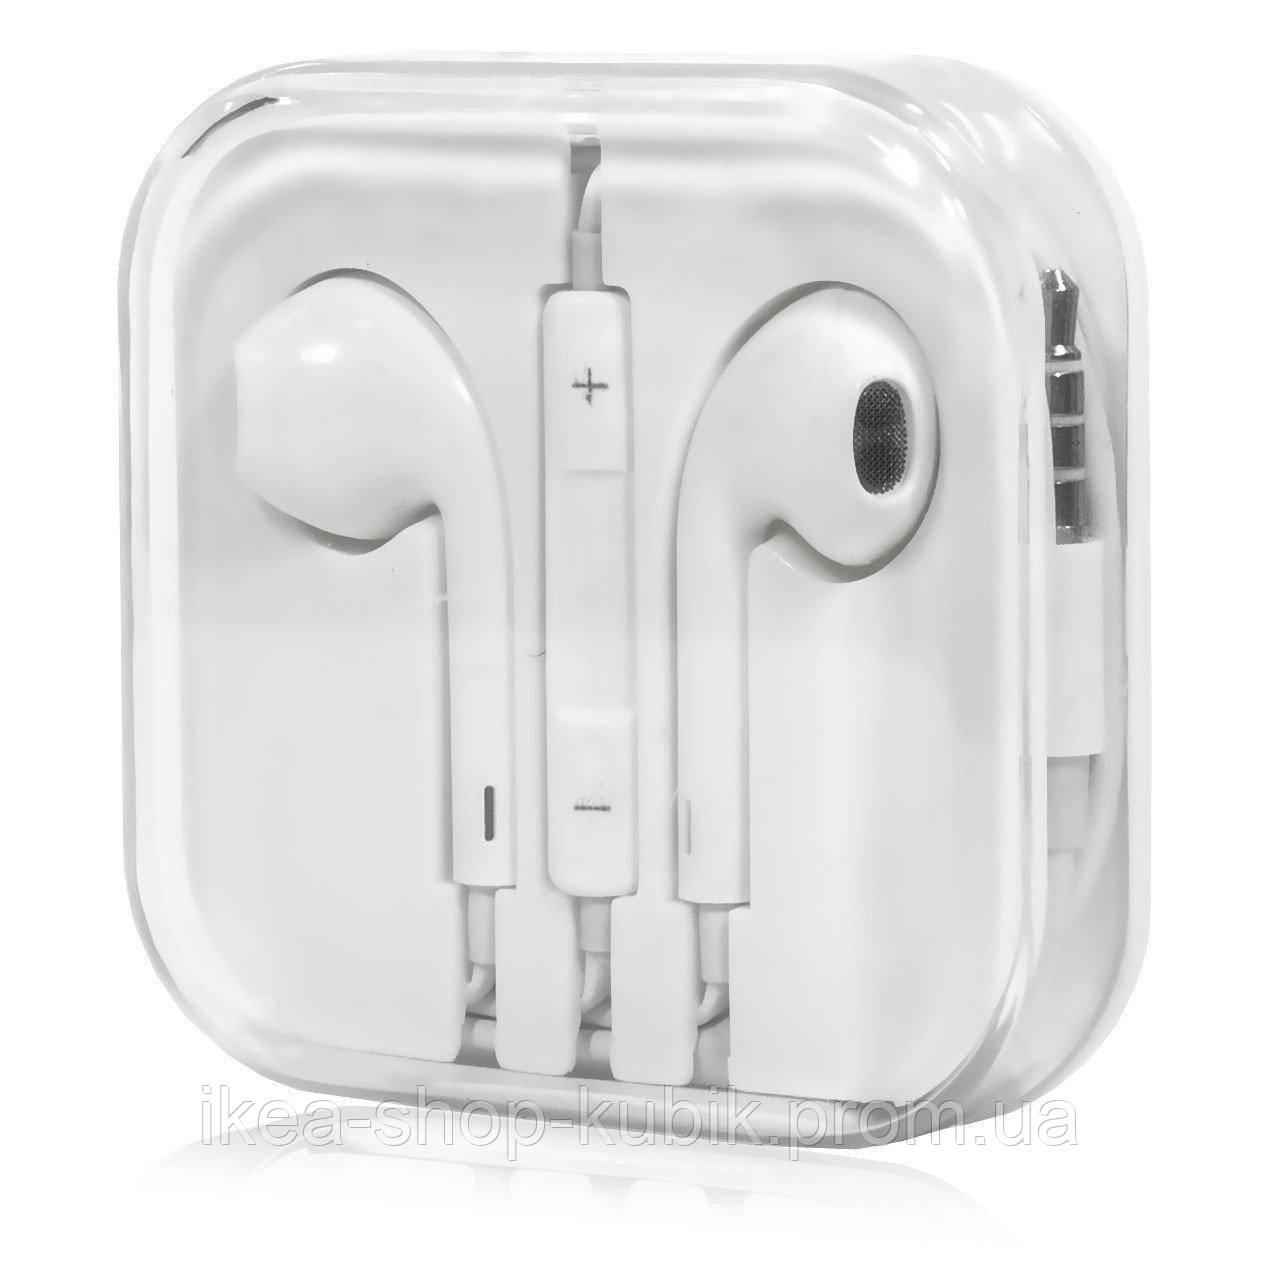 Гарнитура Apple EarPods для iphone